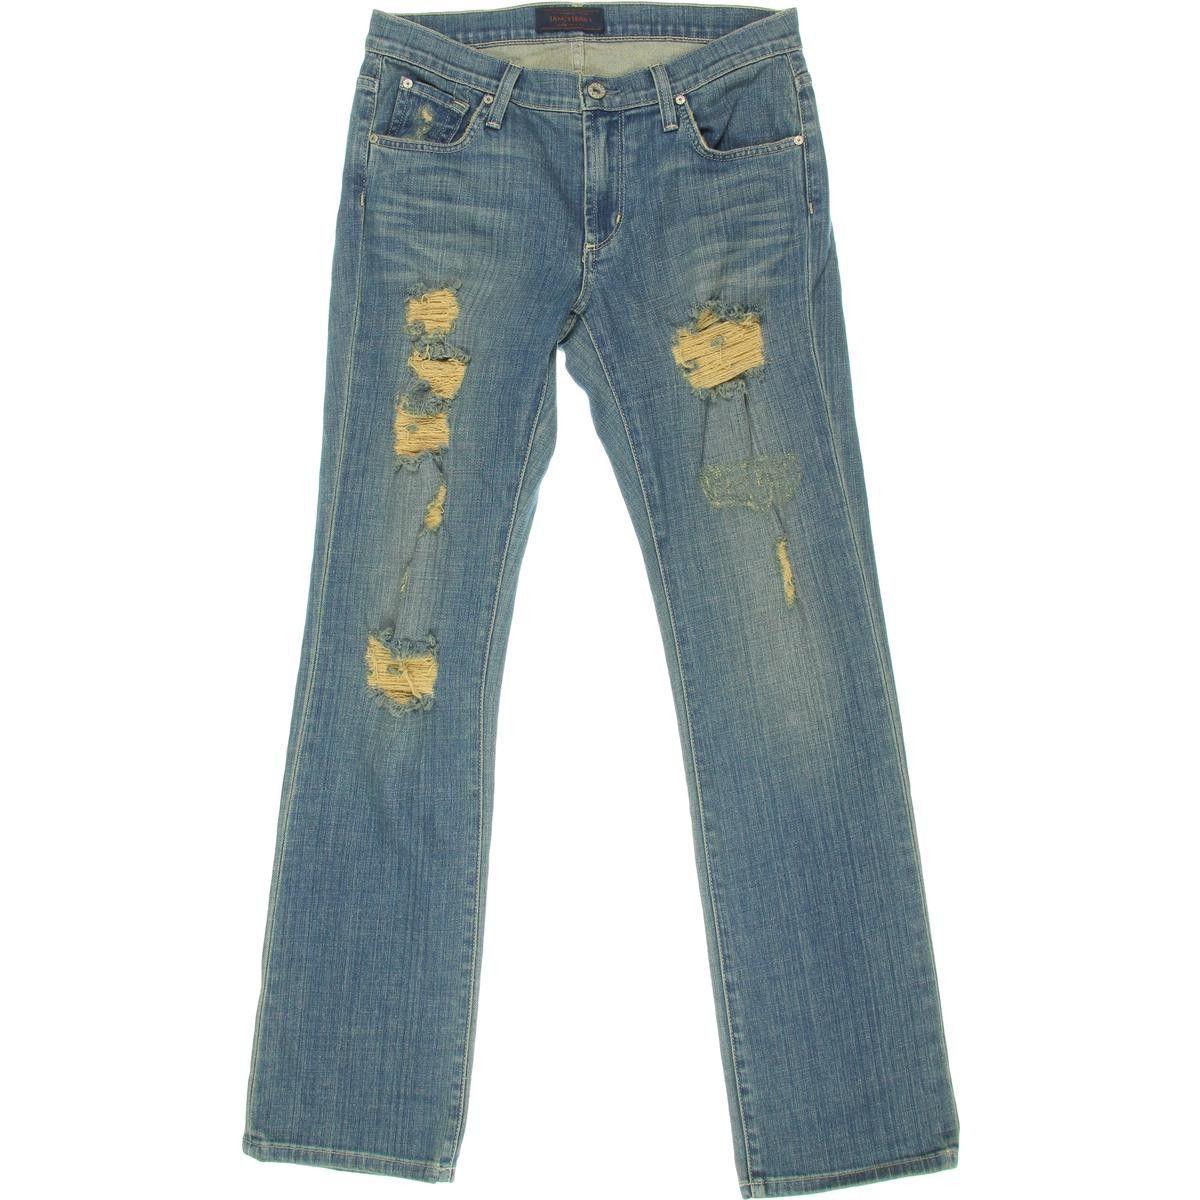 James Jeans Womens Buddy Festival Wash Destroyed Boyfriend Jeans